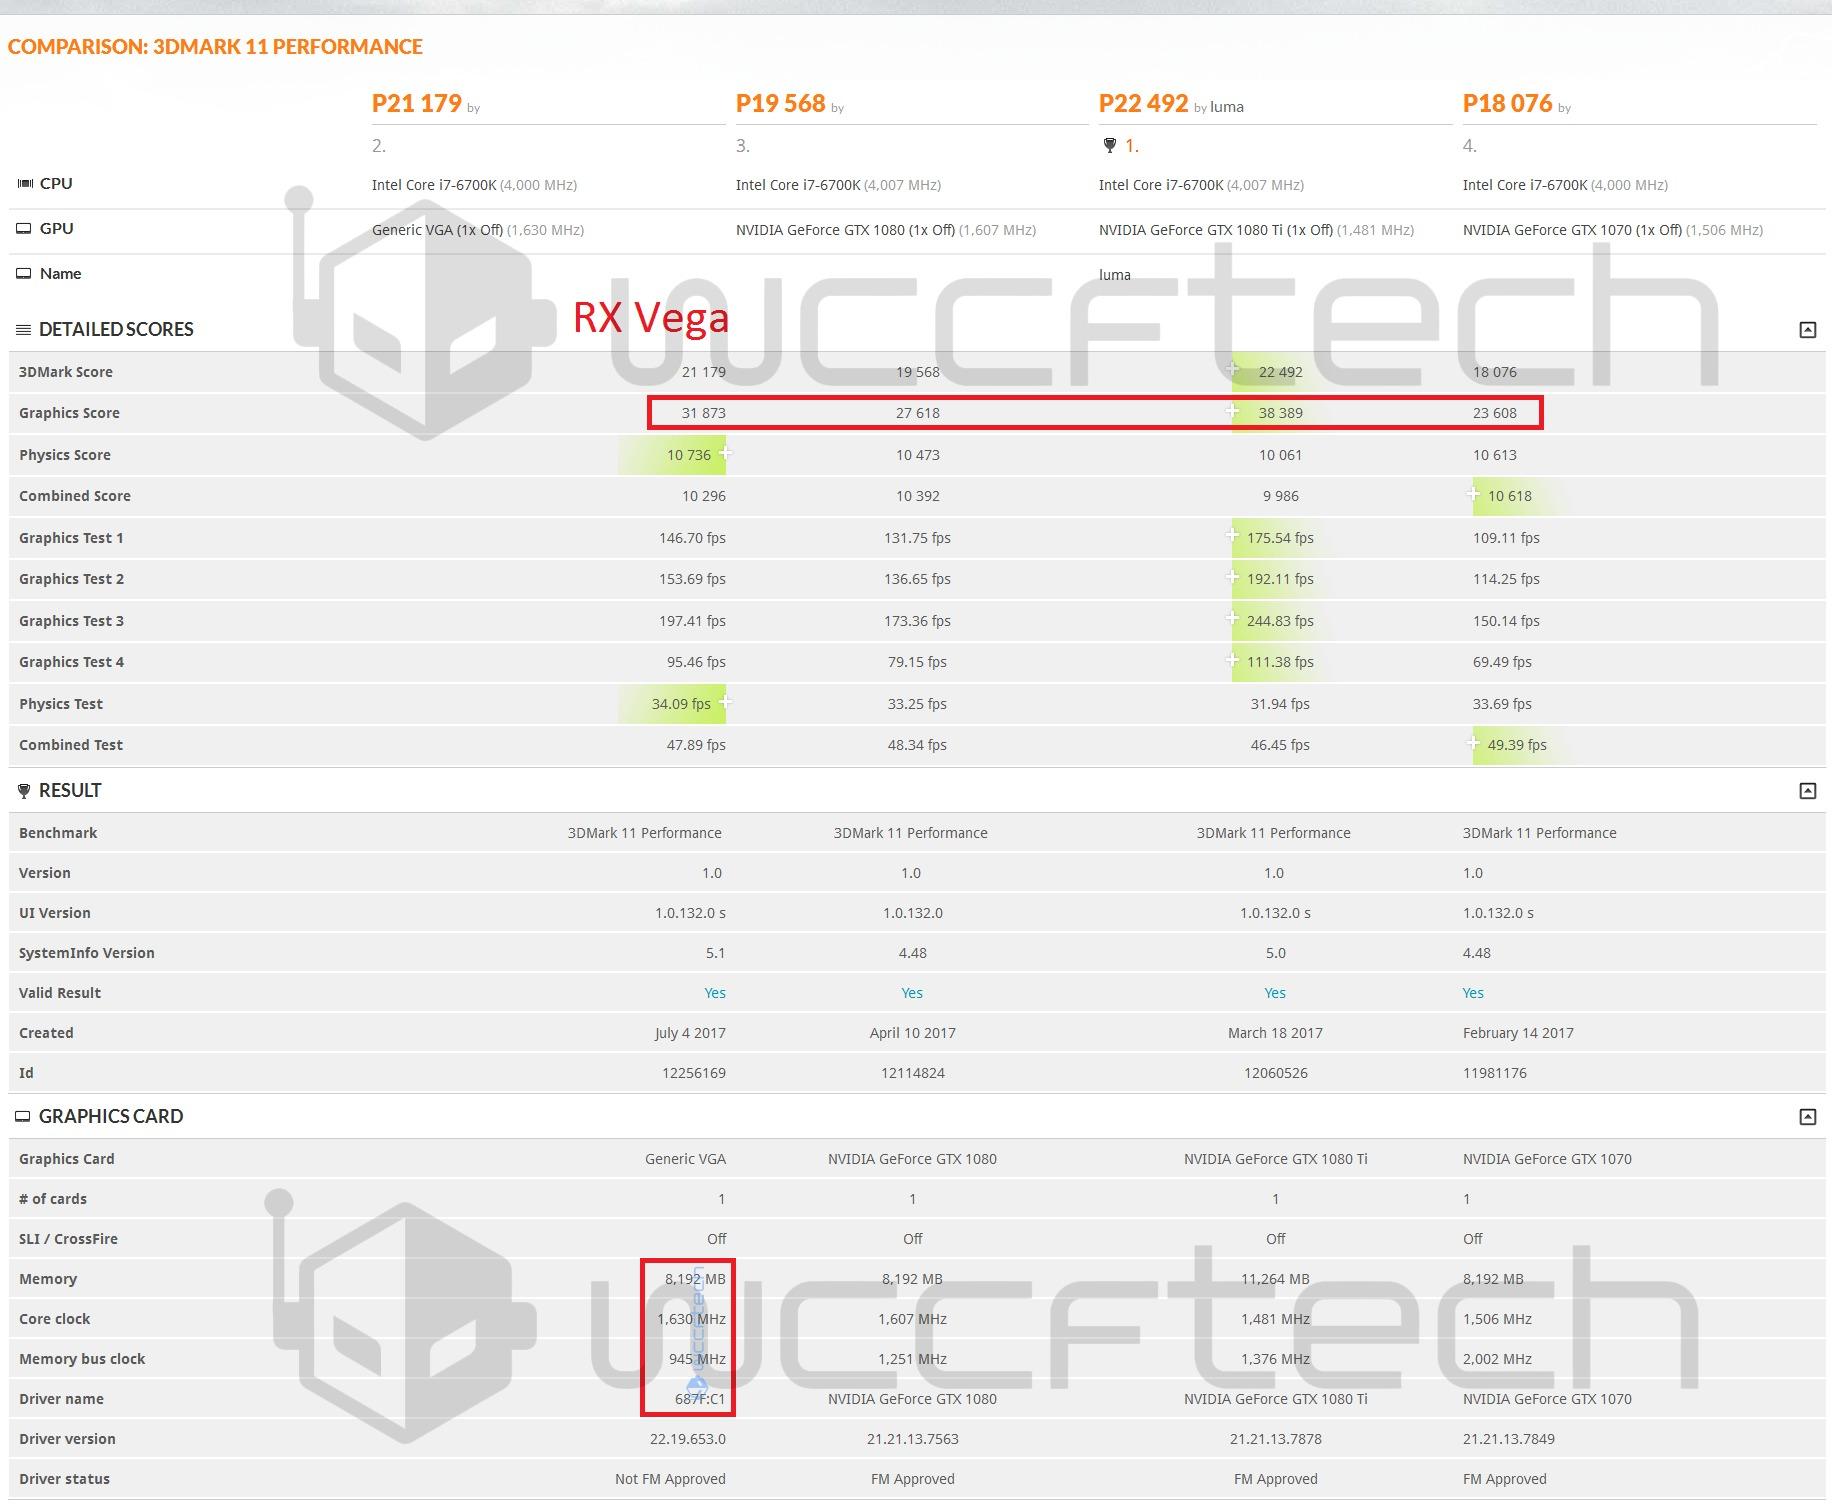 http://www.dsogaming.com/wp-content/uploads/2017/07/AMD-RX-Vega-GTX-1080-Ti-GTX-1080-GTX-1070-3DMark-Performance-Wccftech.jpg